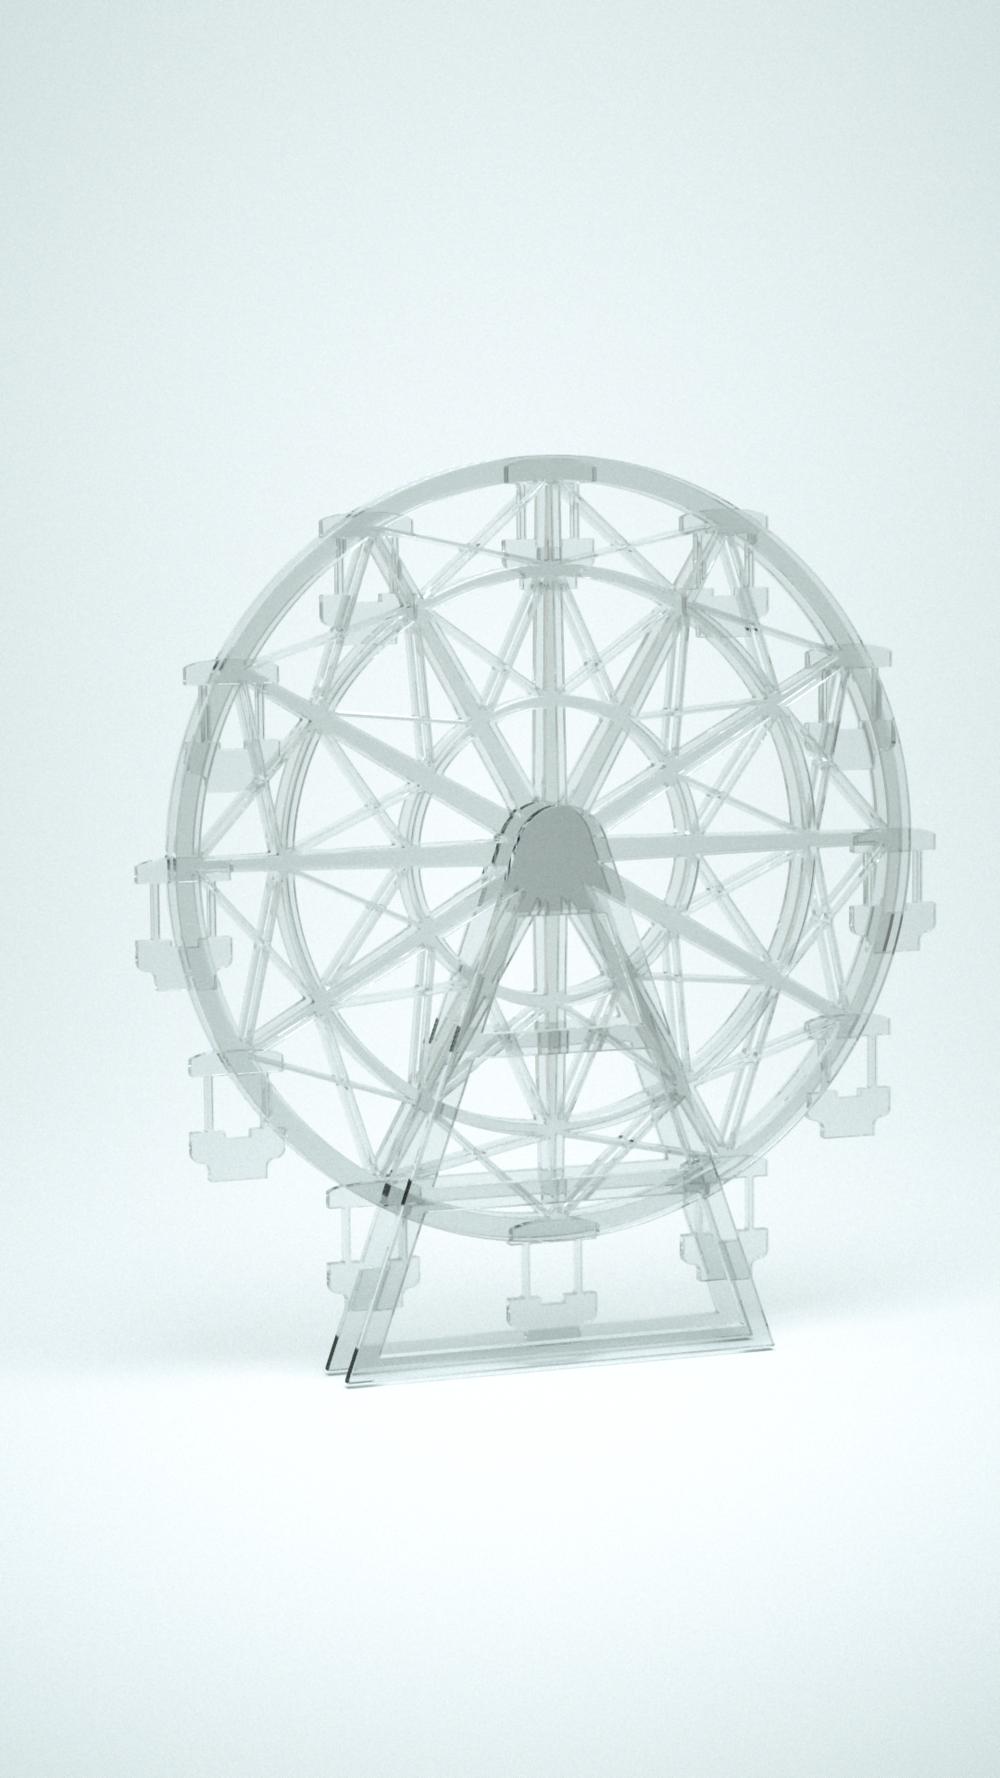 Ferris Wheel, Clear